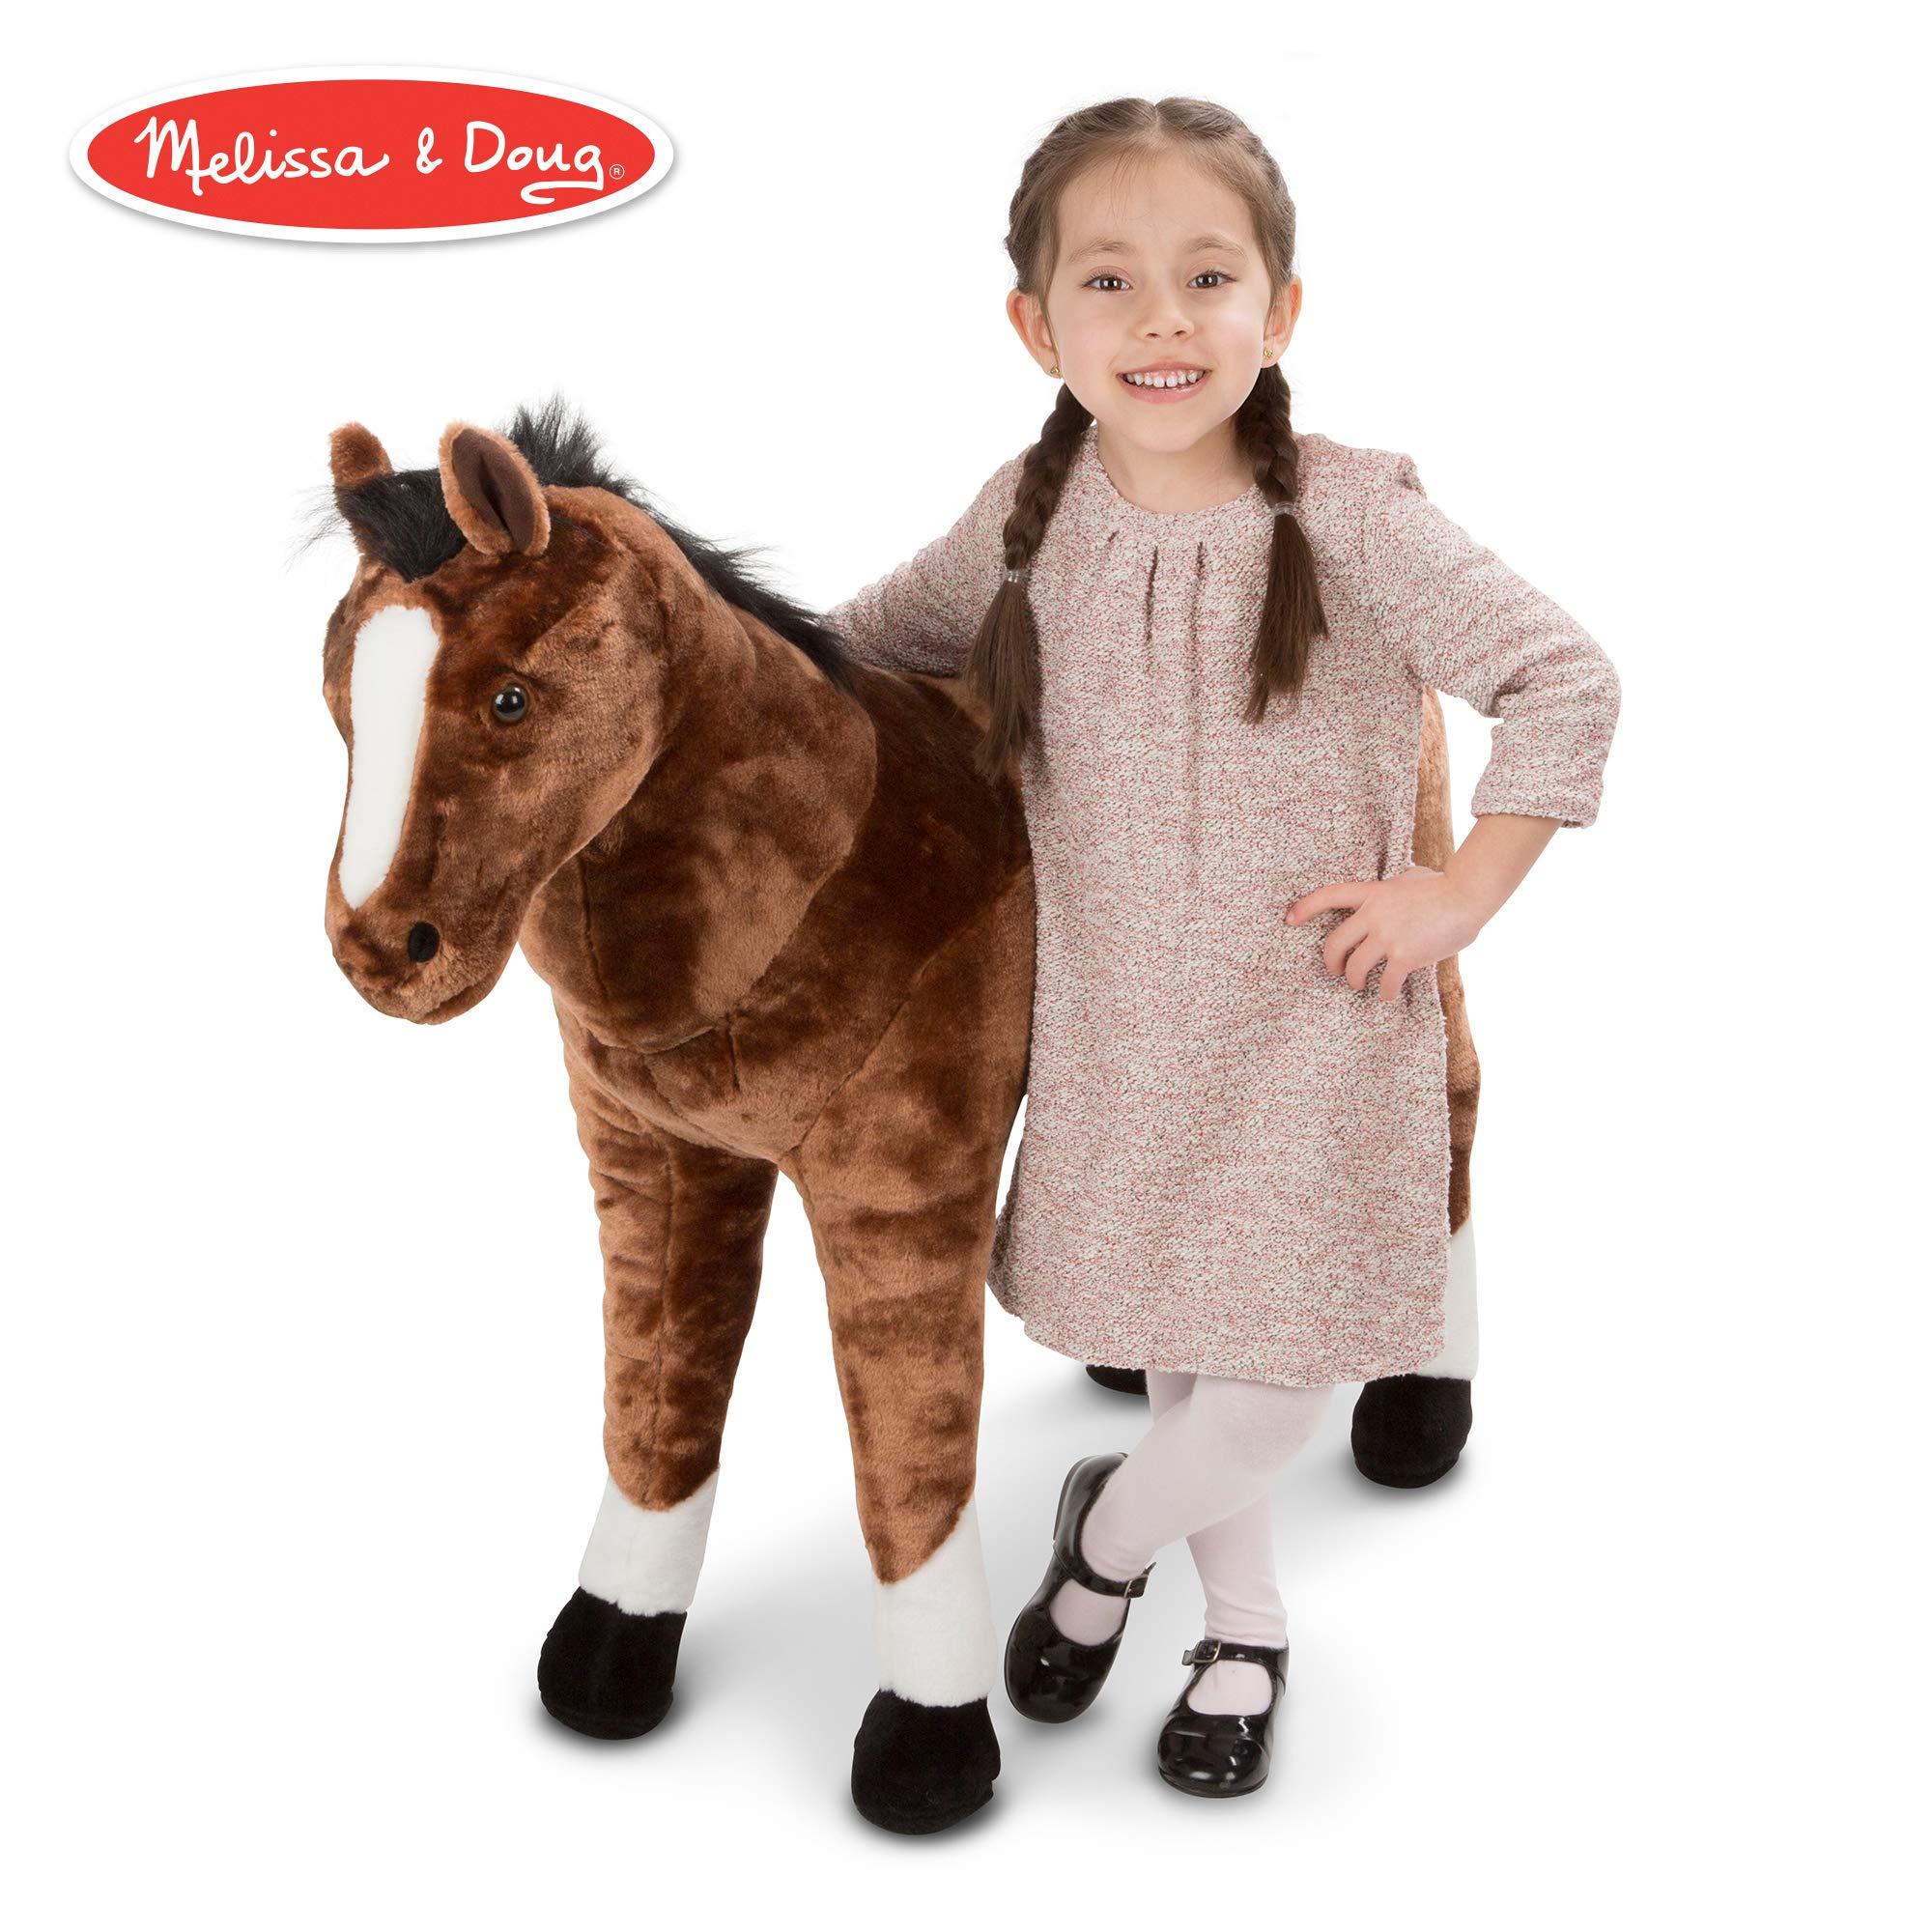 Melissa & Doug Giant Horse - Lifelike Stuffed Animal (nearly 3 feet tall) by Melissa & Doug